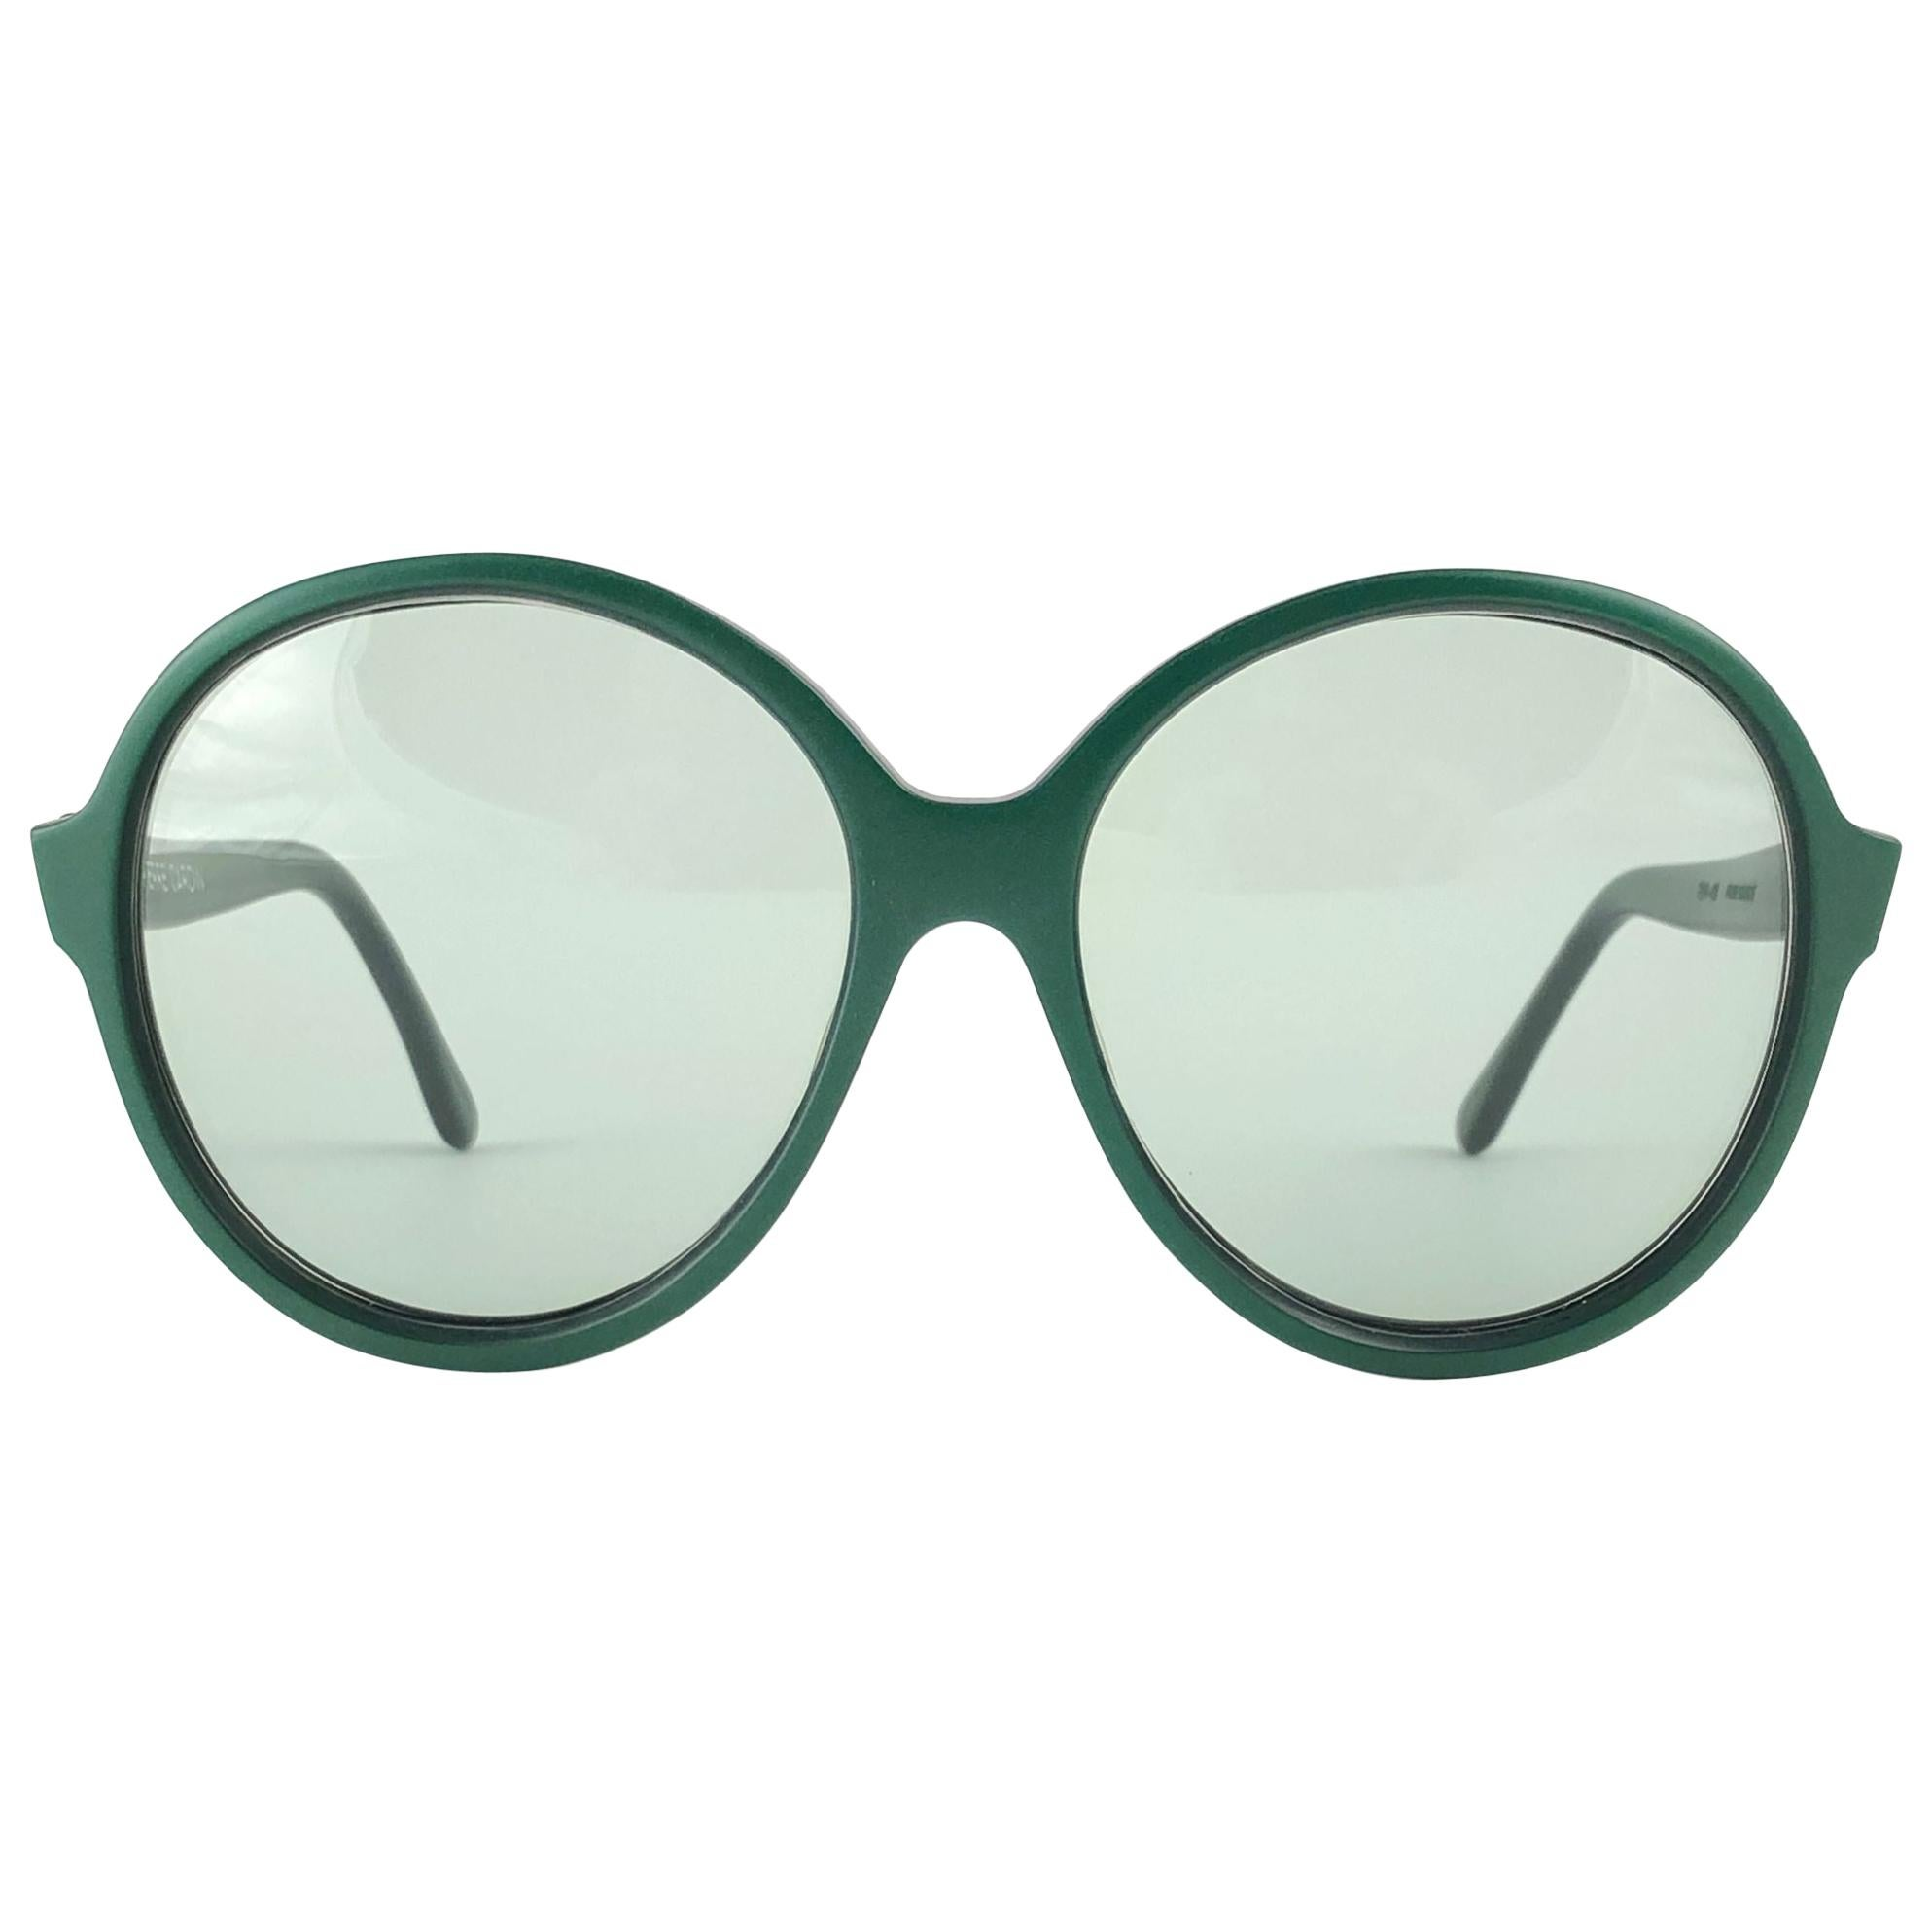 New Vintage Rare Pierre Cardin Dark Green Oversized 1960's sunglasses